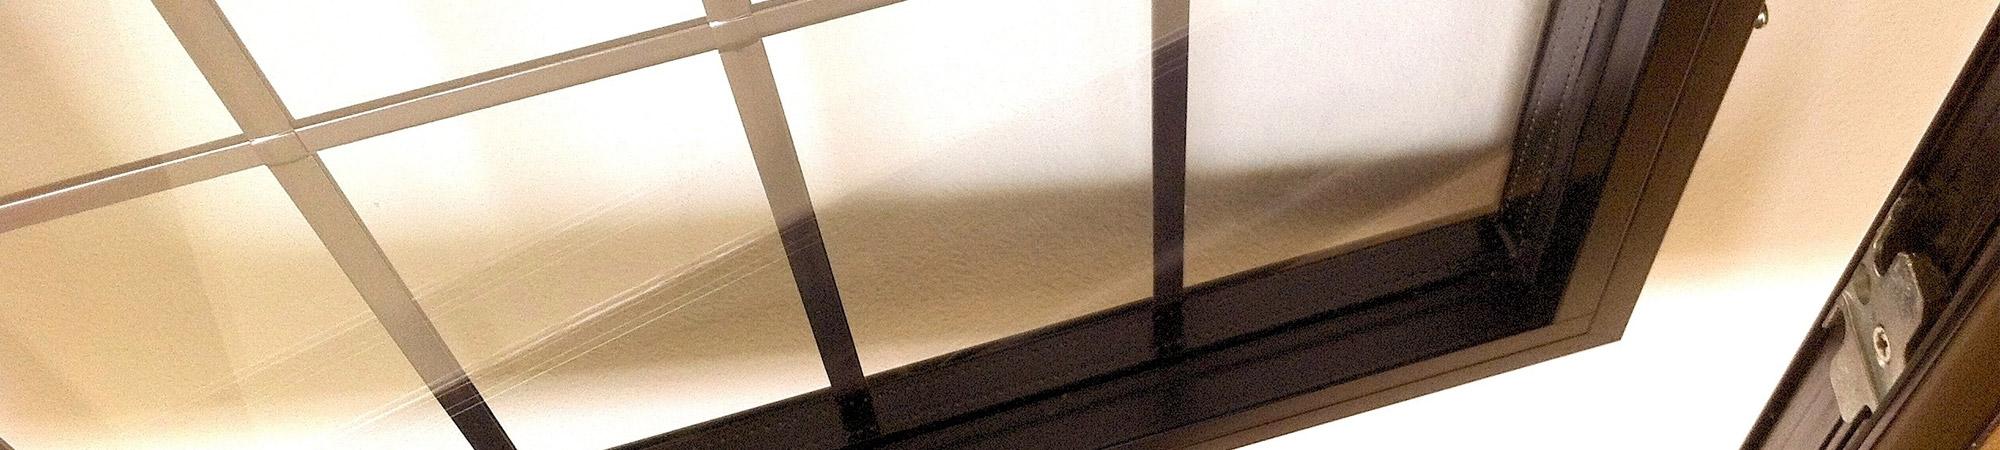 bosal aluminijumska alu i pvc stolarija cene. Black Bedroom Furniture Sets. Home Design Ideas